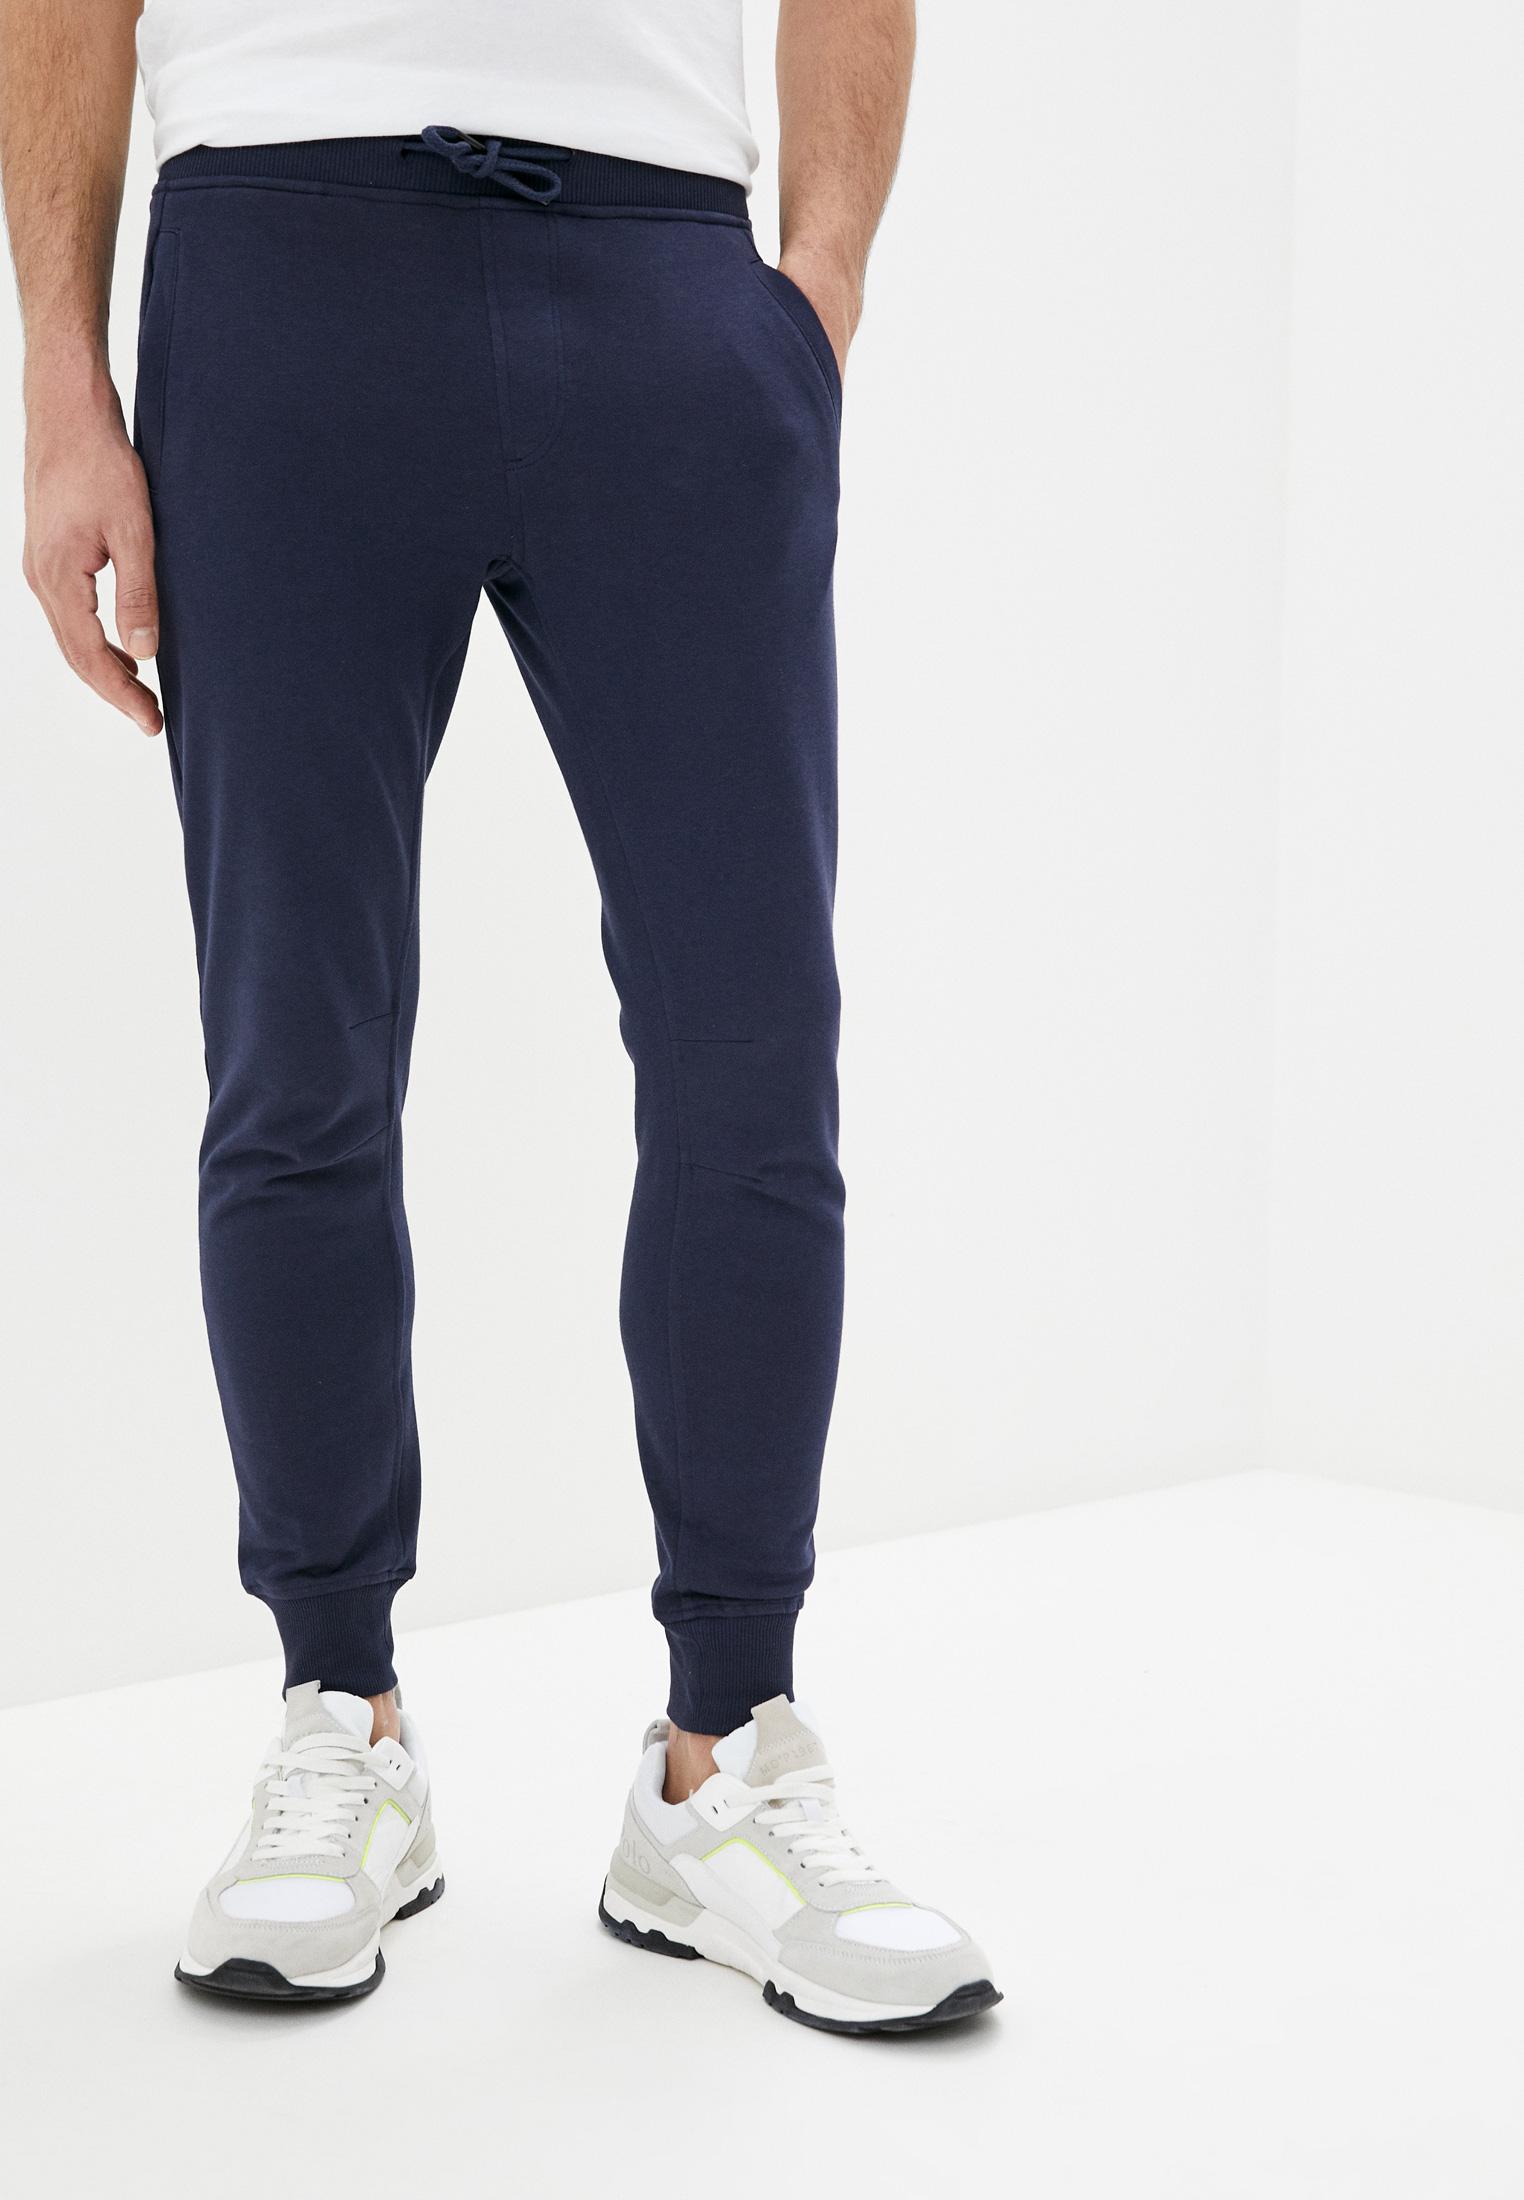 Мужские спортивные брюки JIMMY SANDERS (Джимми Сандерс) 20W TRSM16000 NAVY